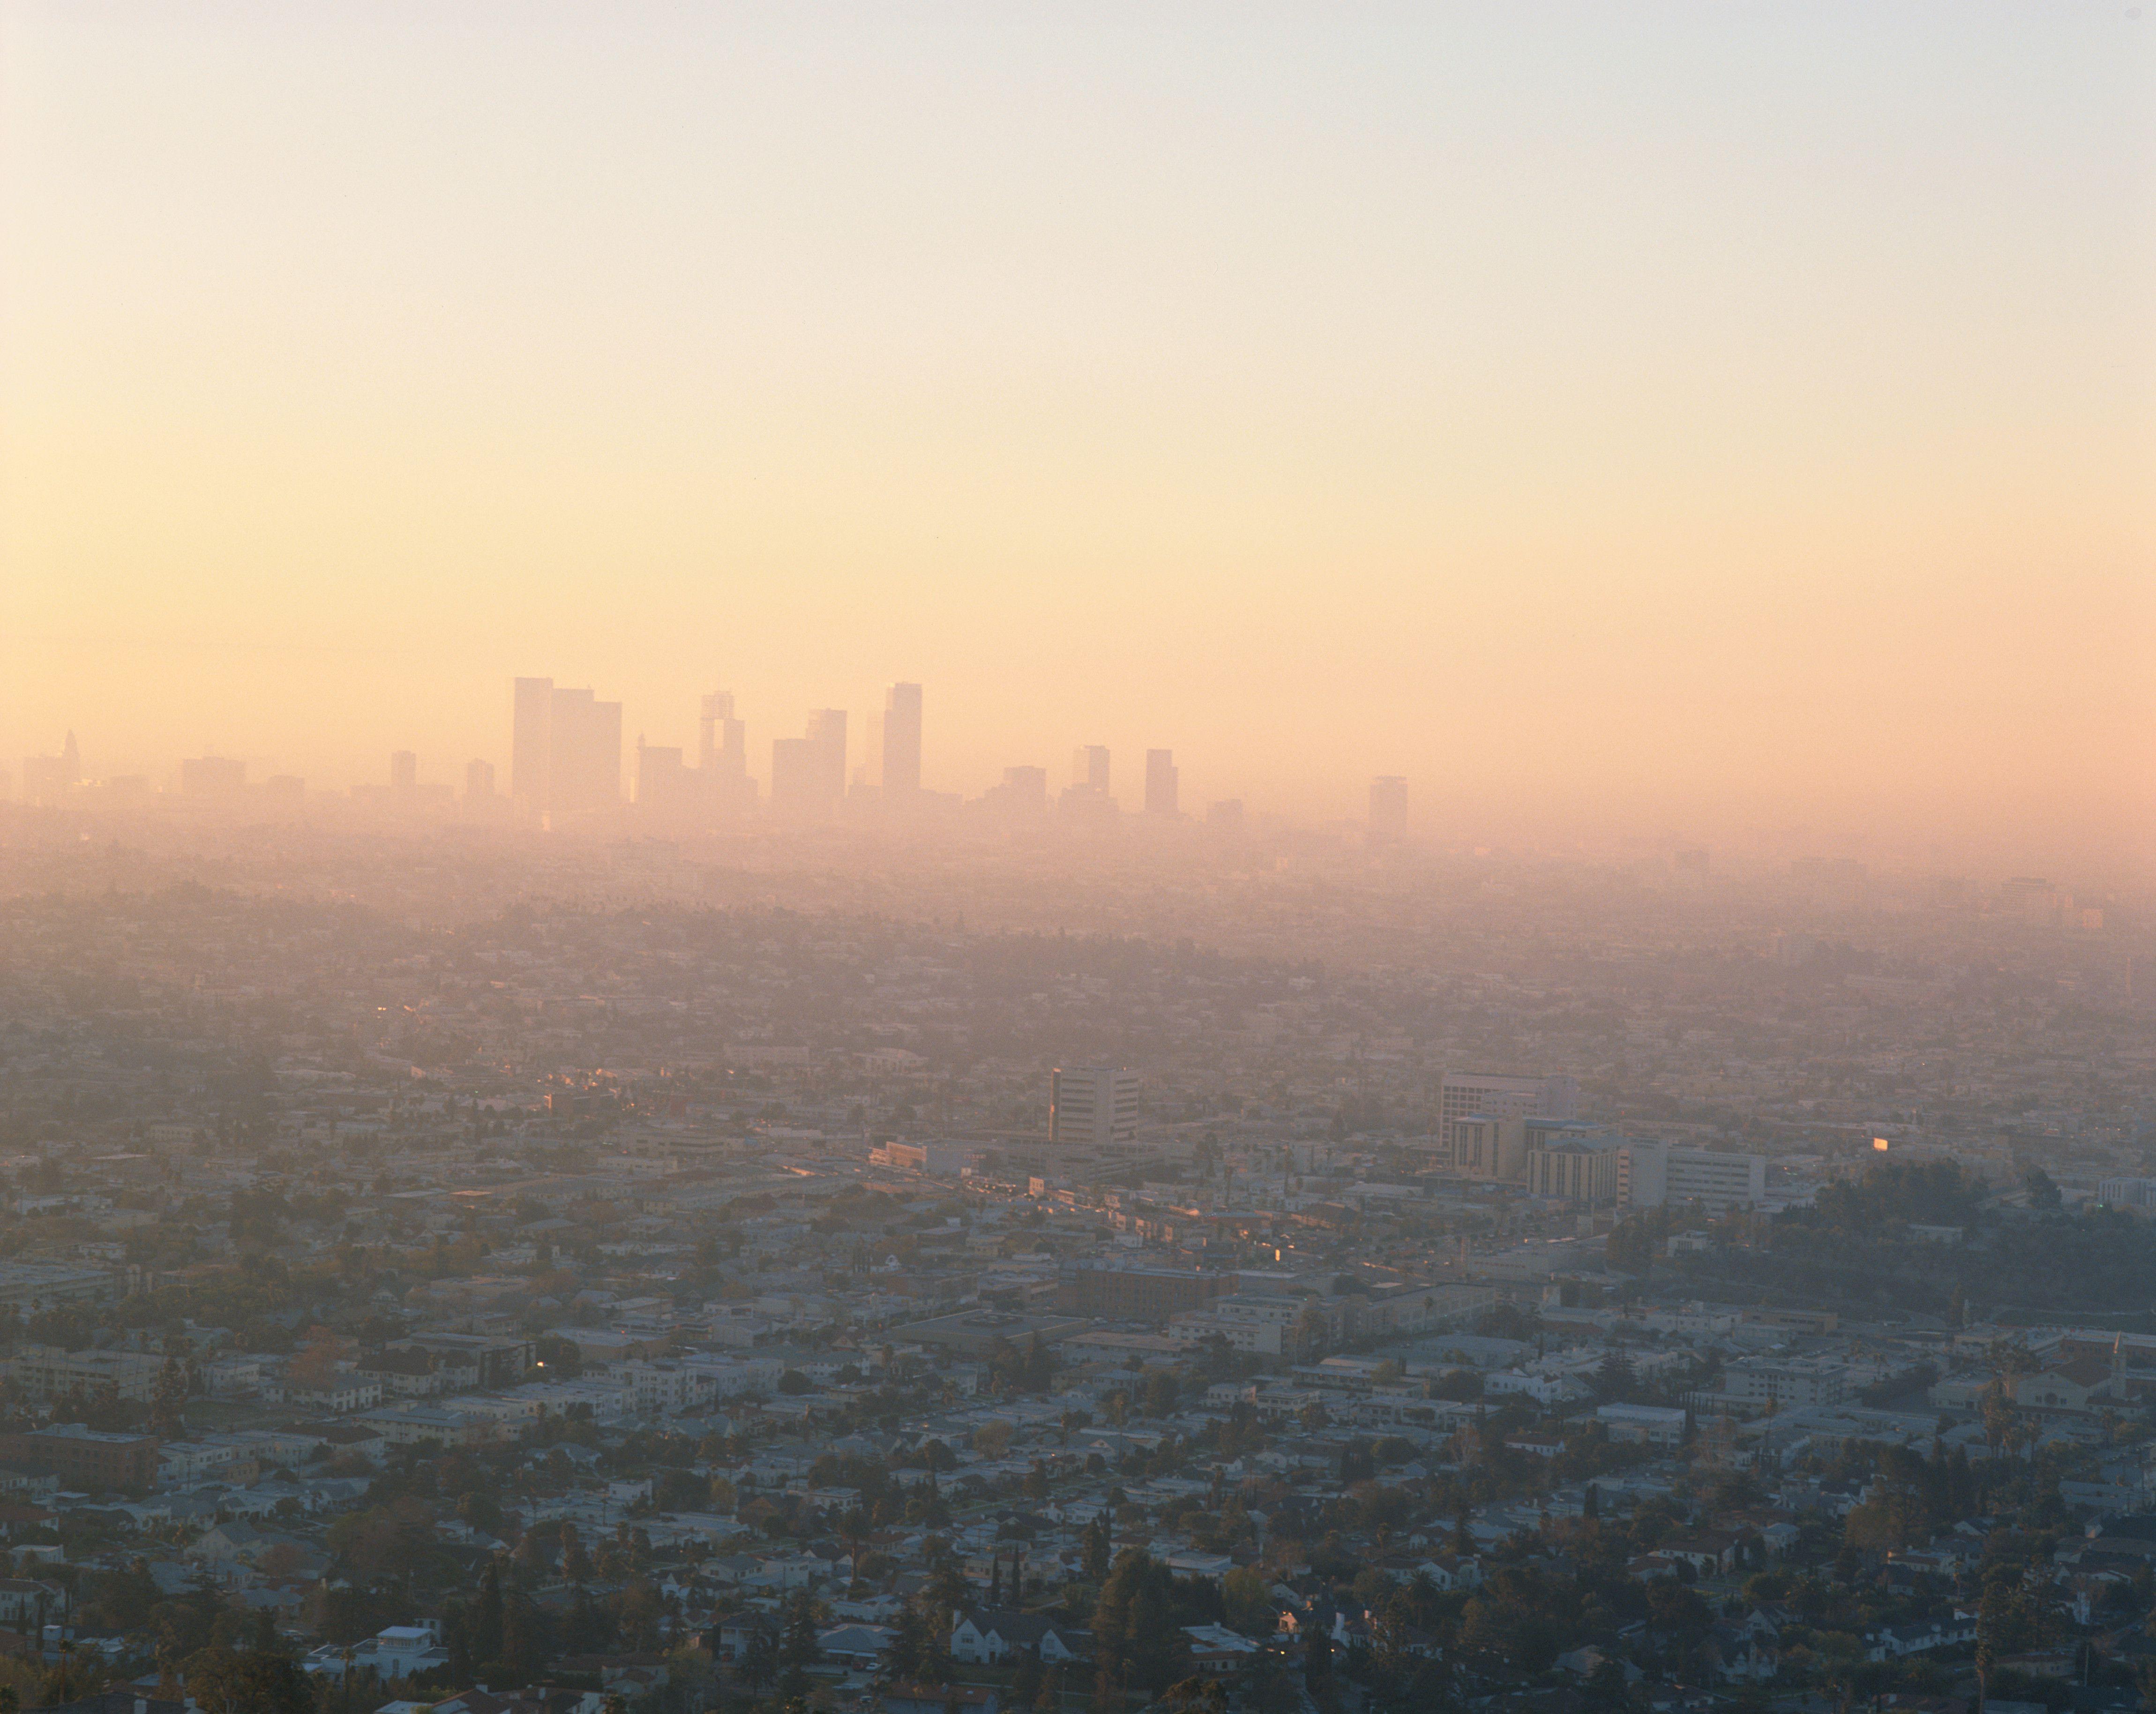 Smog: Photochemical Smog, Air Pollution and Ozone